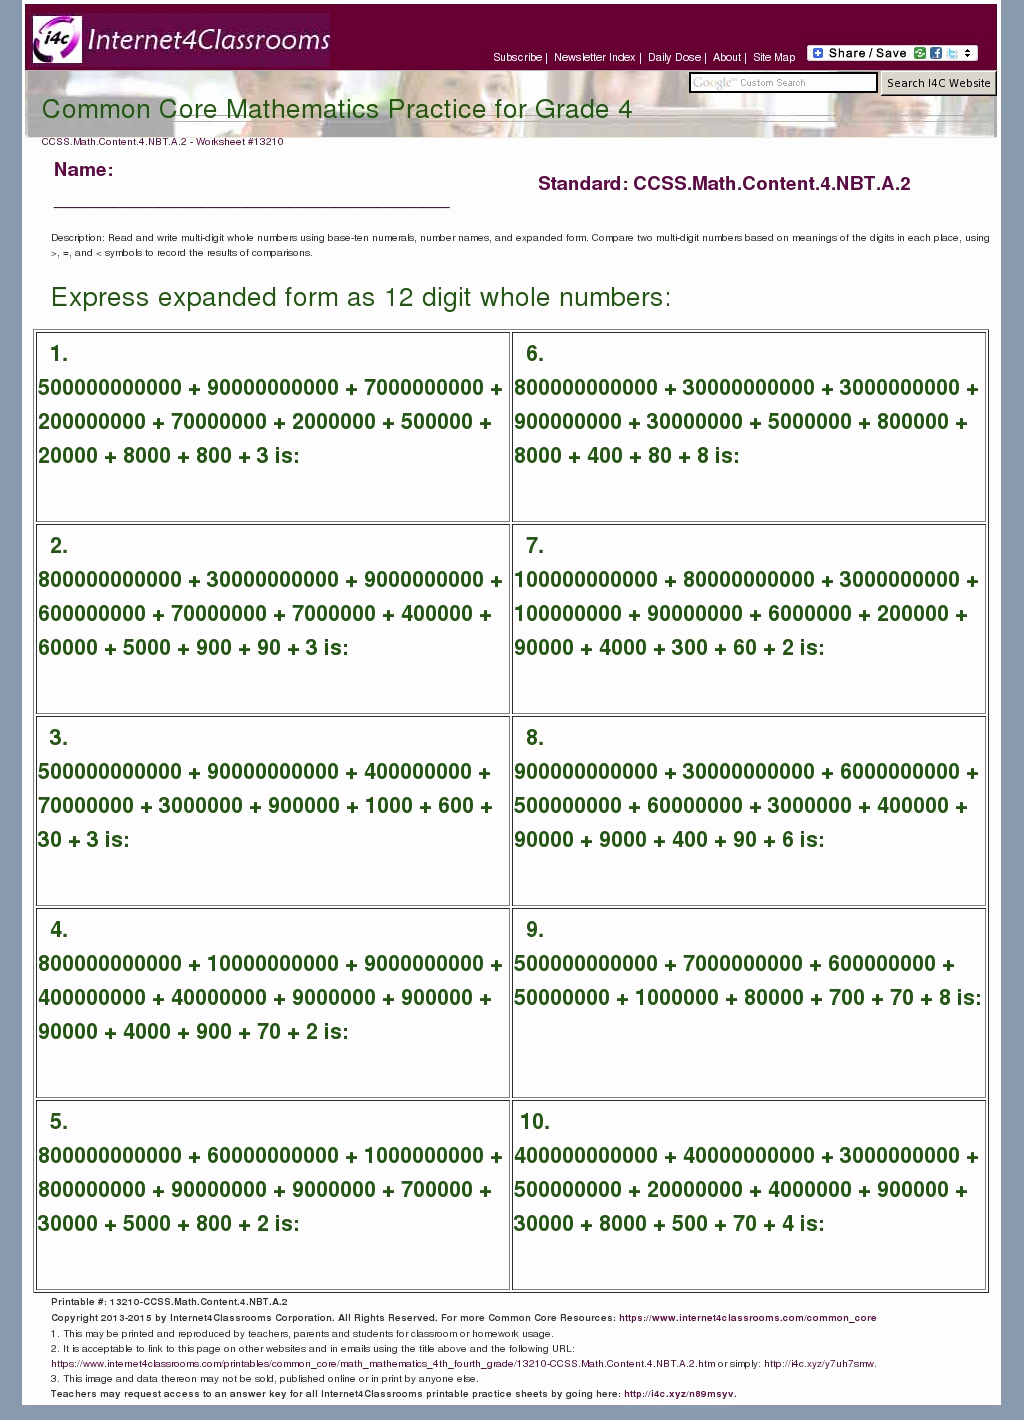 4 Nbt 6 Worksheets Fresh 32 [pdf] 4 Nbt A 1 Worksheets Printable Zip Docx Download